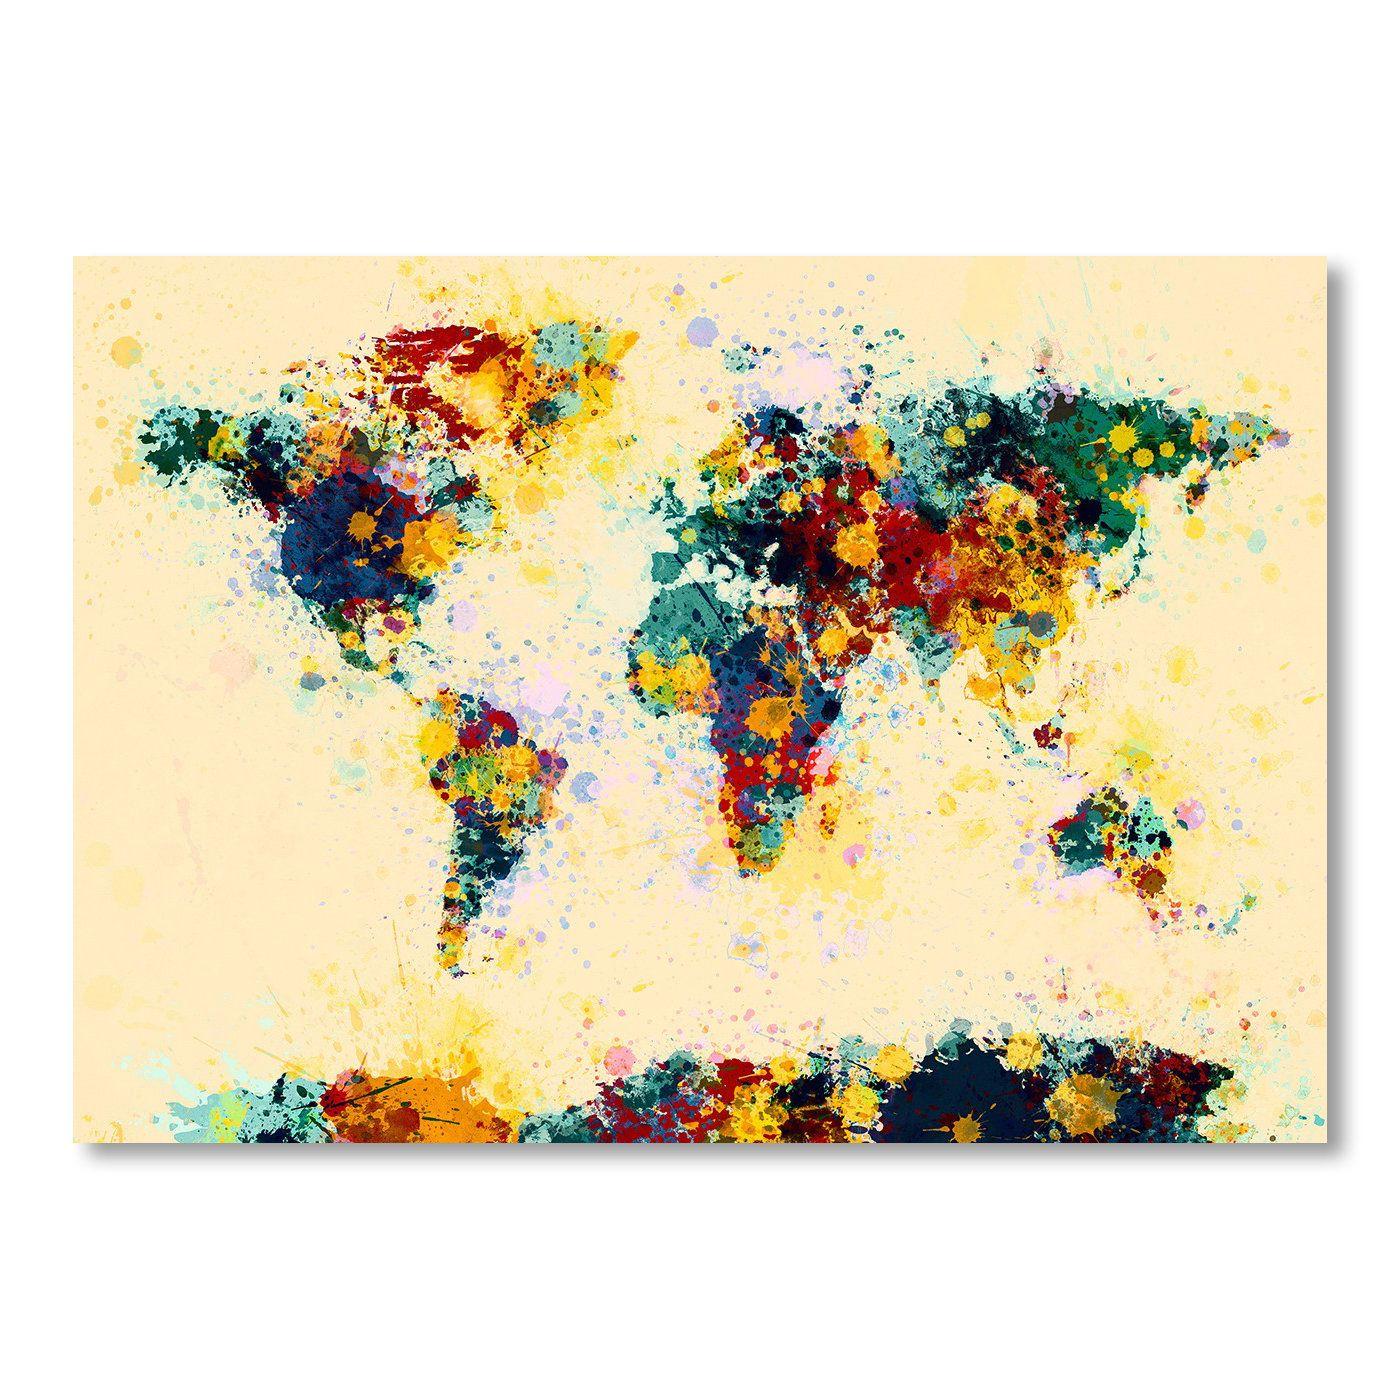 World Map Watercolor Wall Mural | Watercolor | Pinterest ...